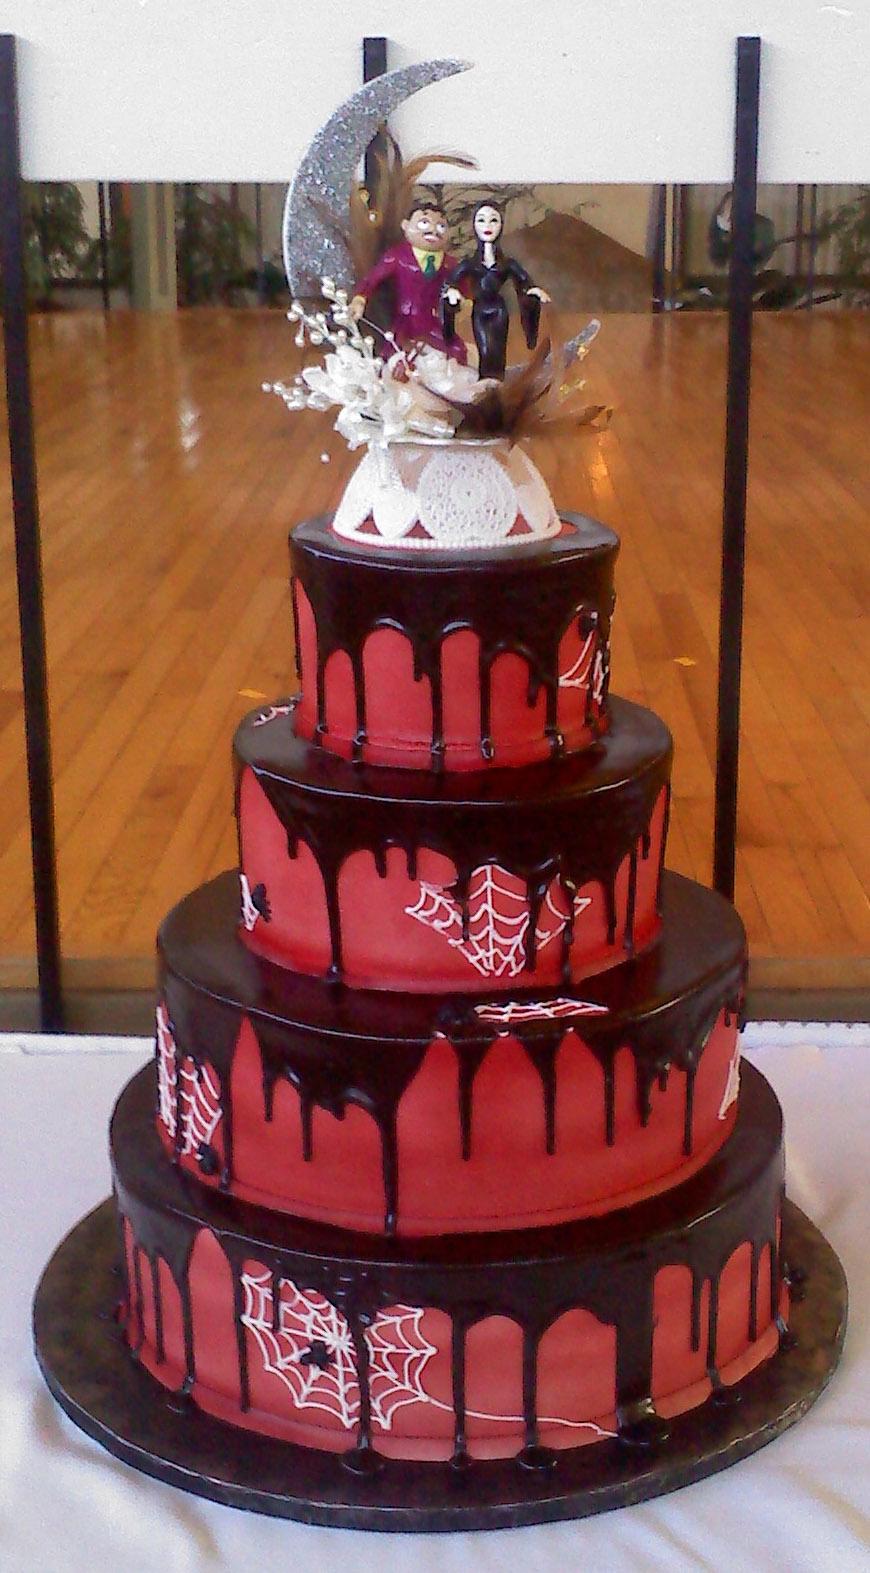 25 unique wedding cakes ideas wedding cakes ideas Unique Wedding Cake ideas